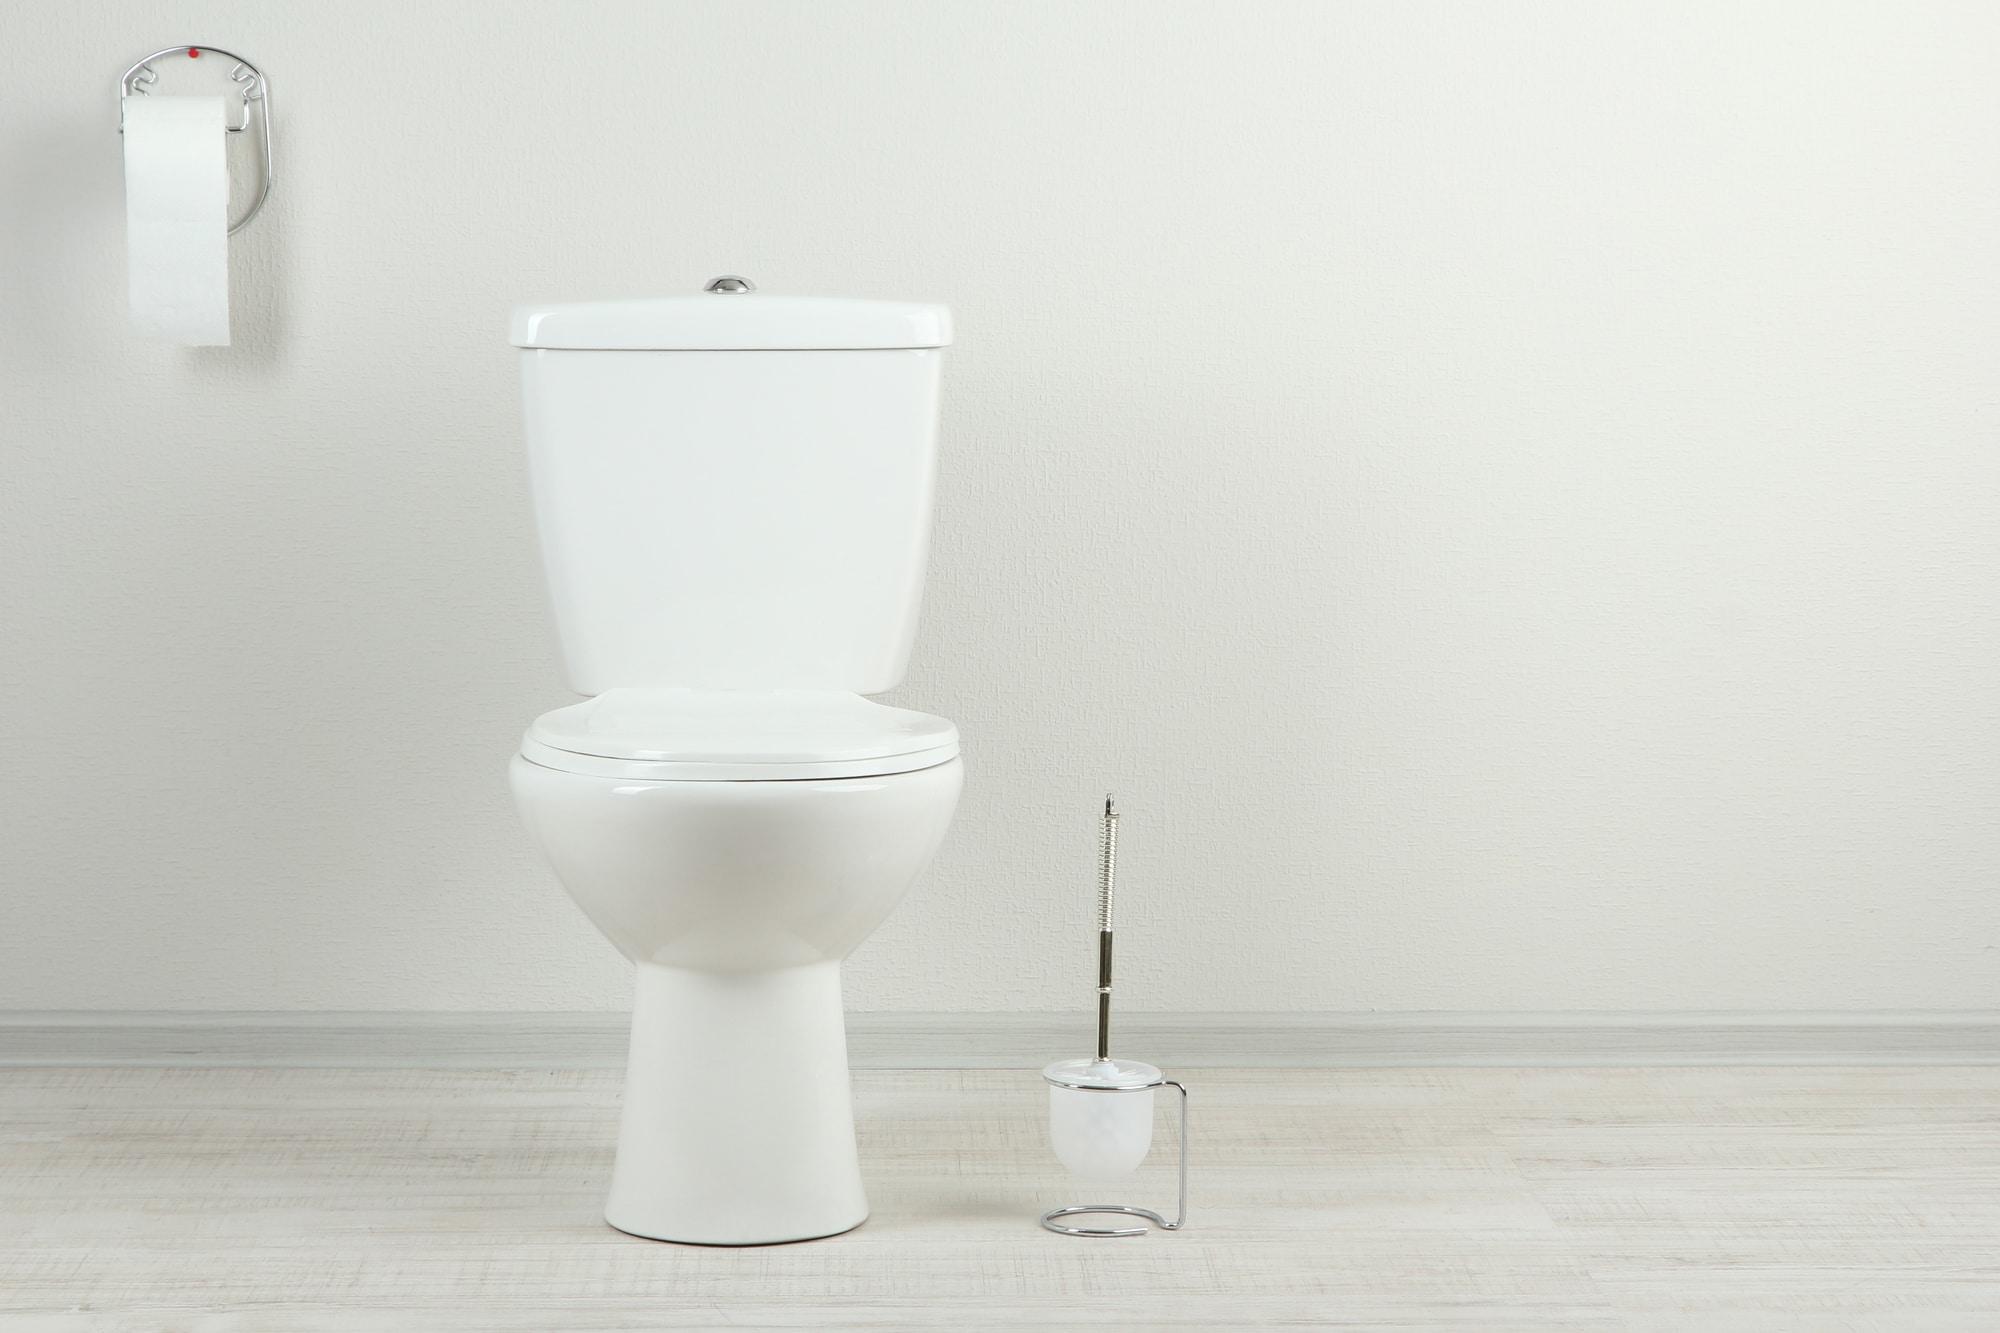 Are Toilet Tanks Standard?